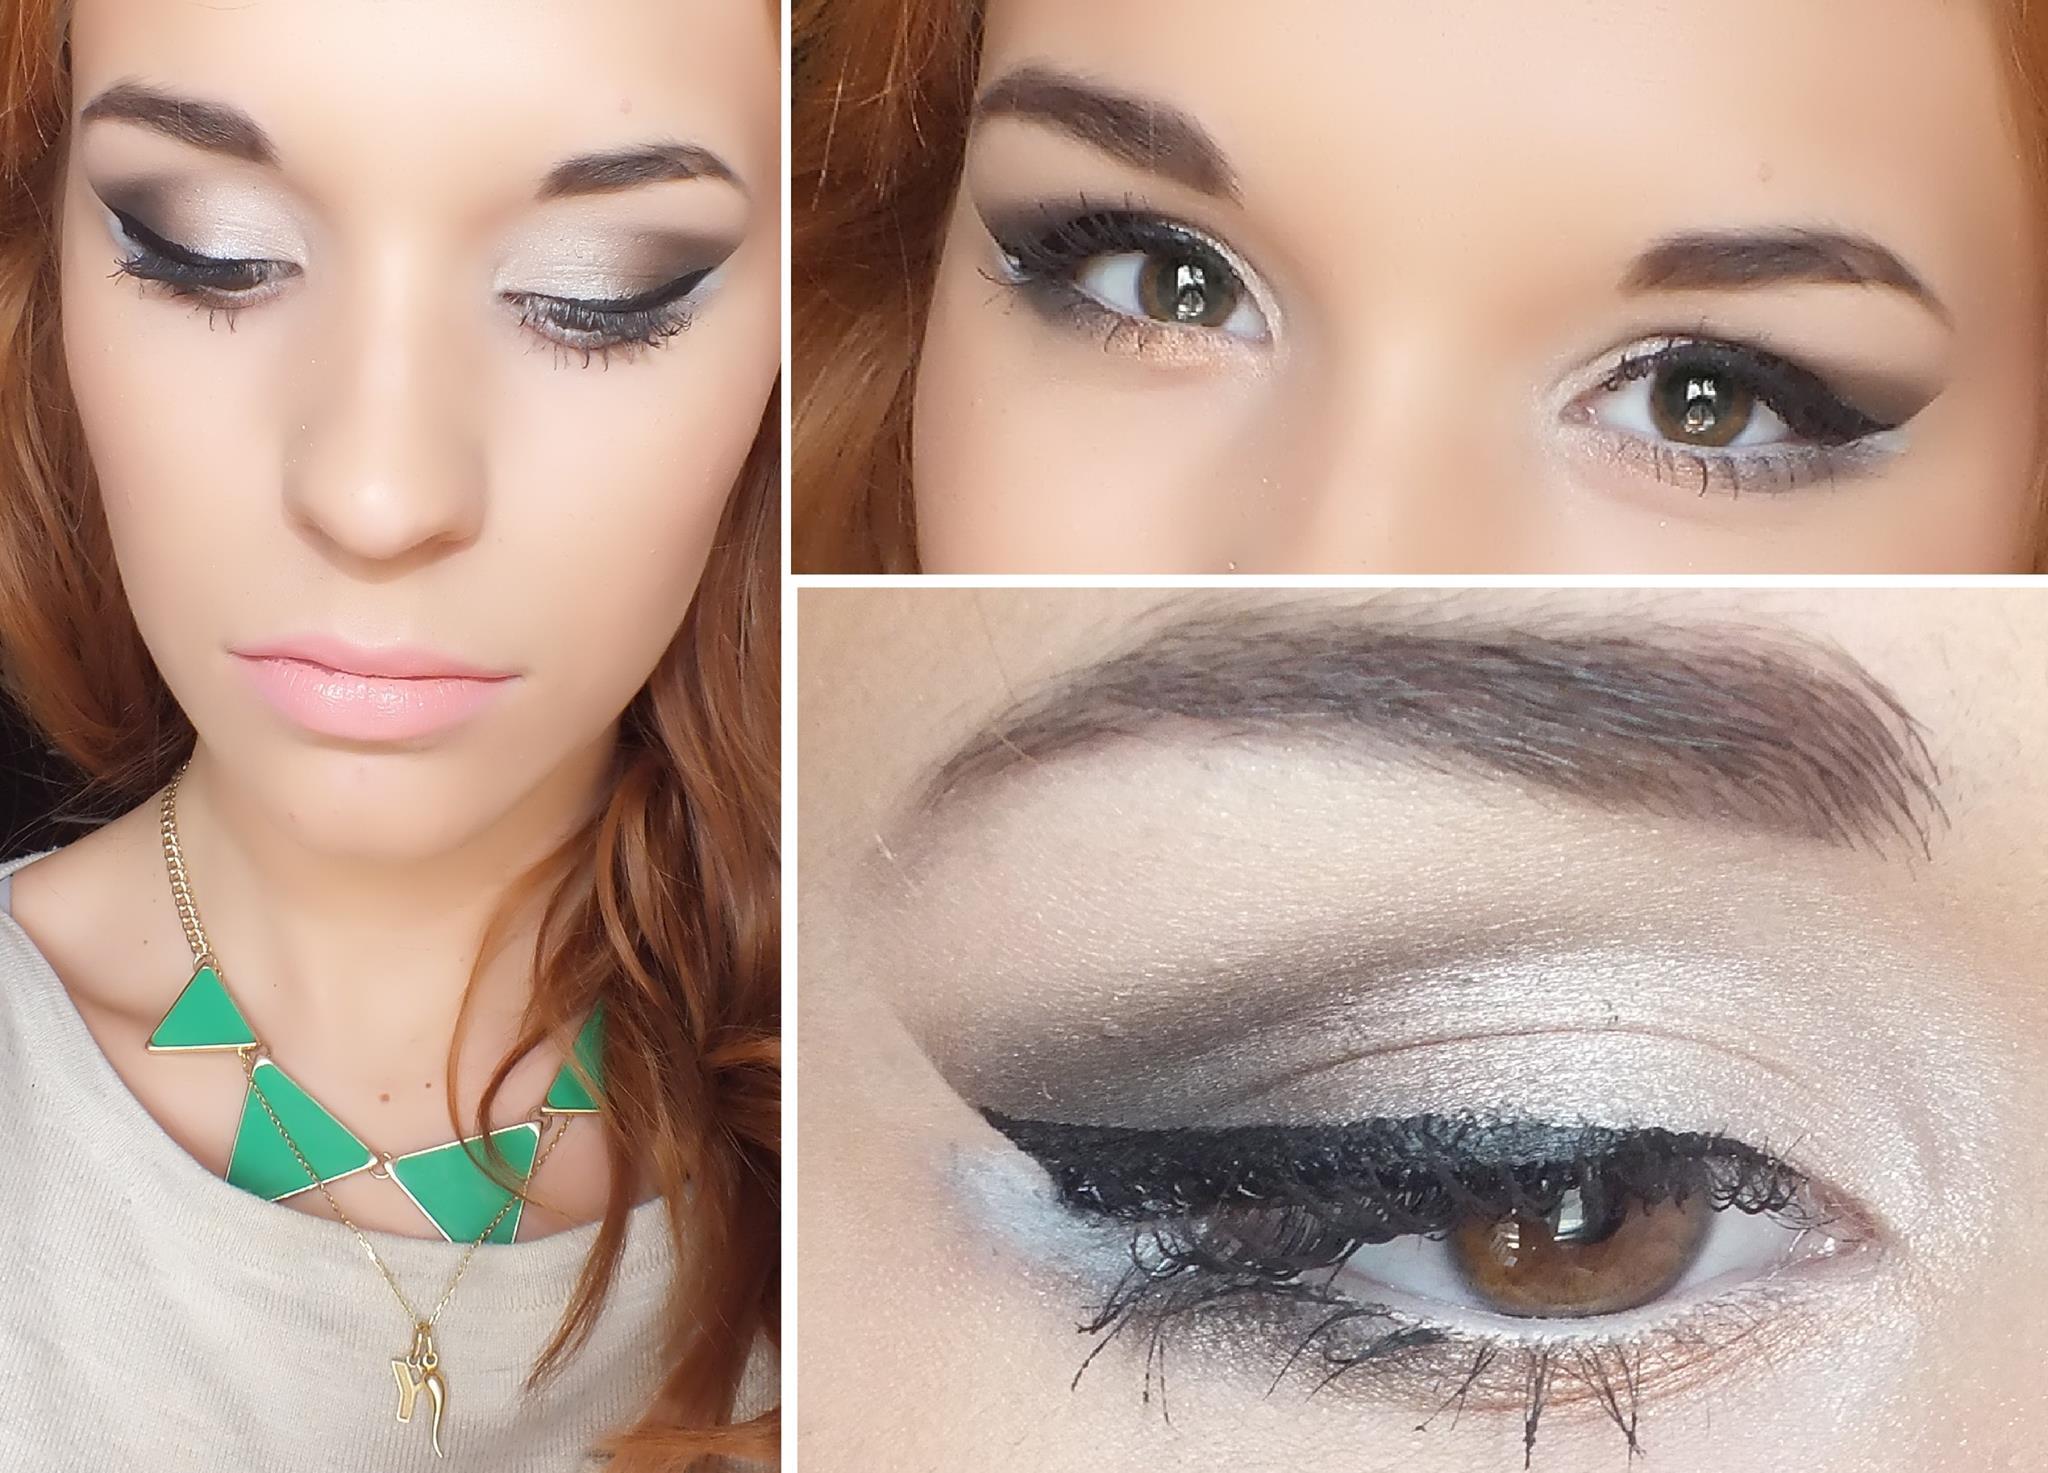 maquillage yeux gris et blanc